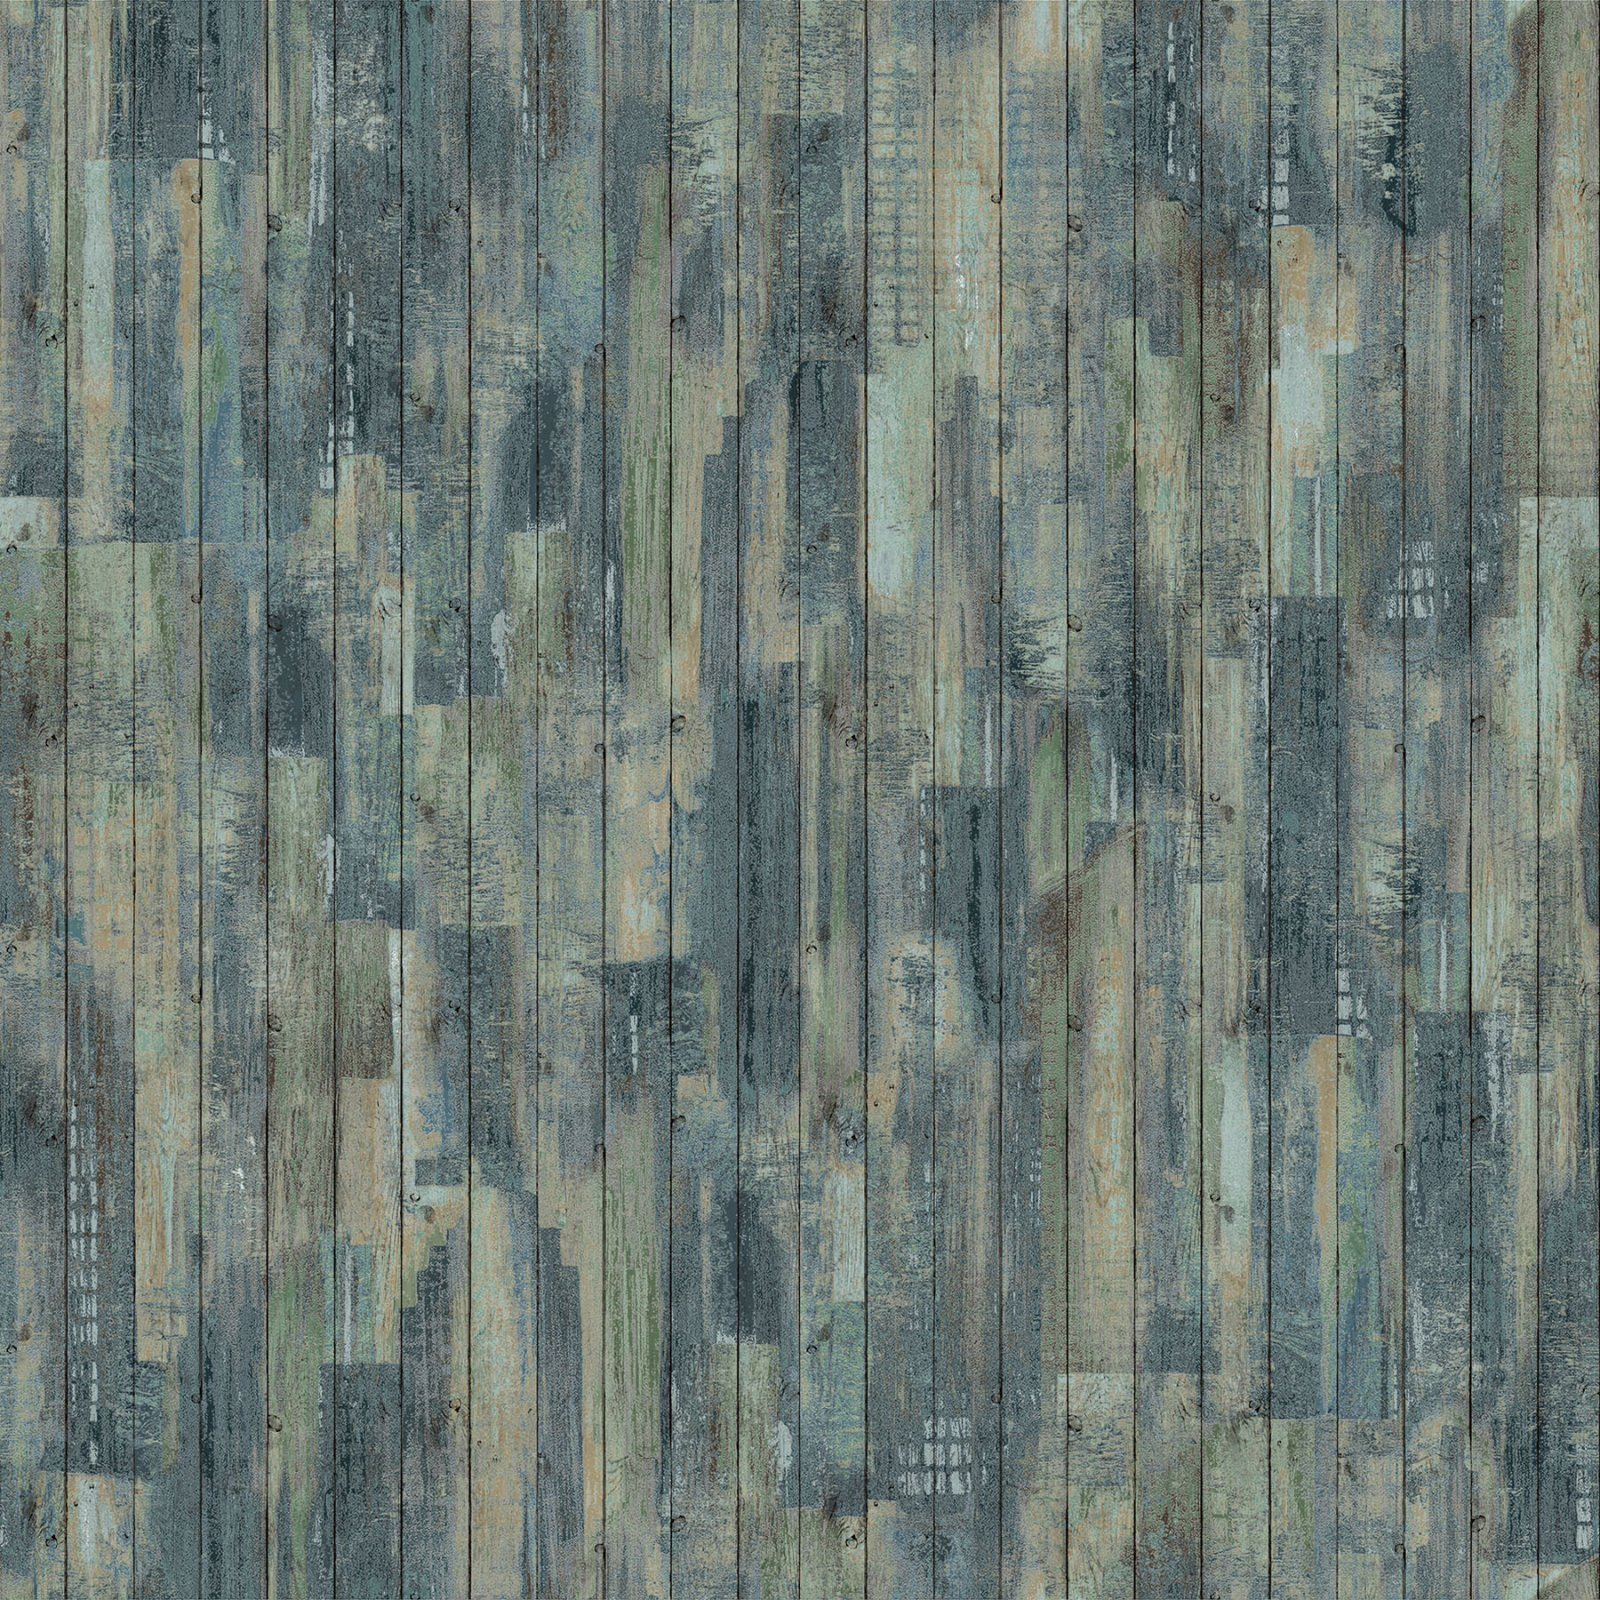 Outdoor Adventure Distressed Wood - Teal